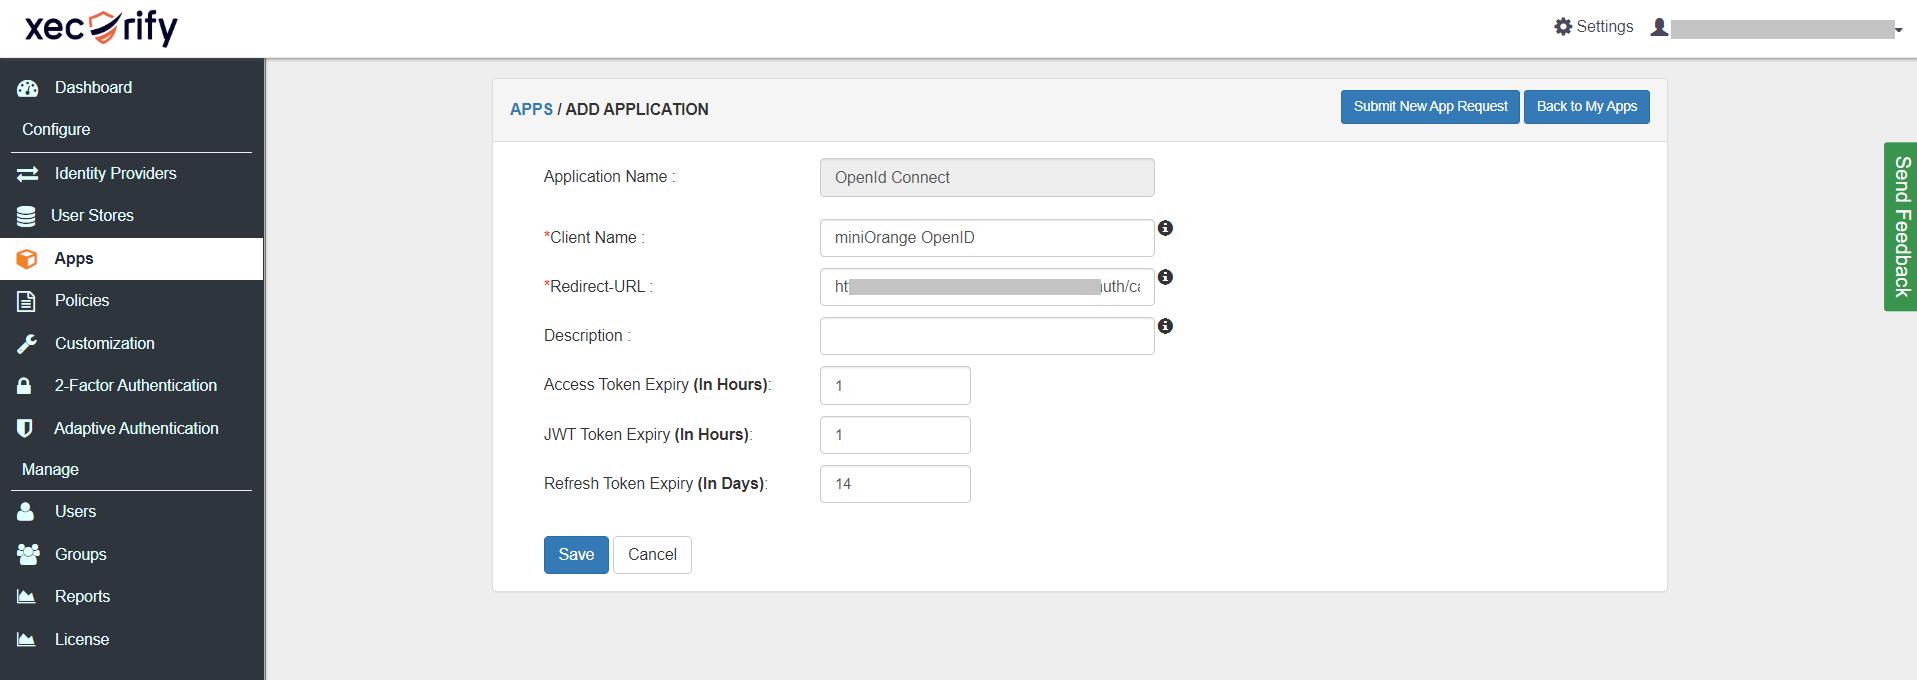 OAuth/OpenID/OIDC Single Sign On (SSO), miniOrange SSO, Fill Application Information